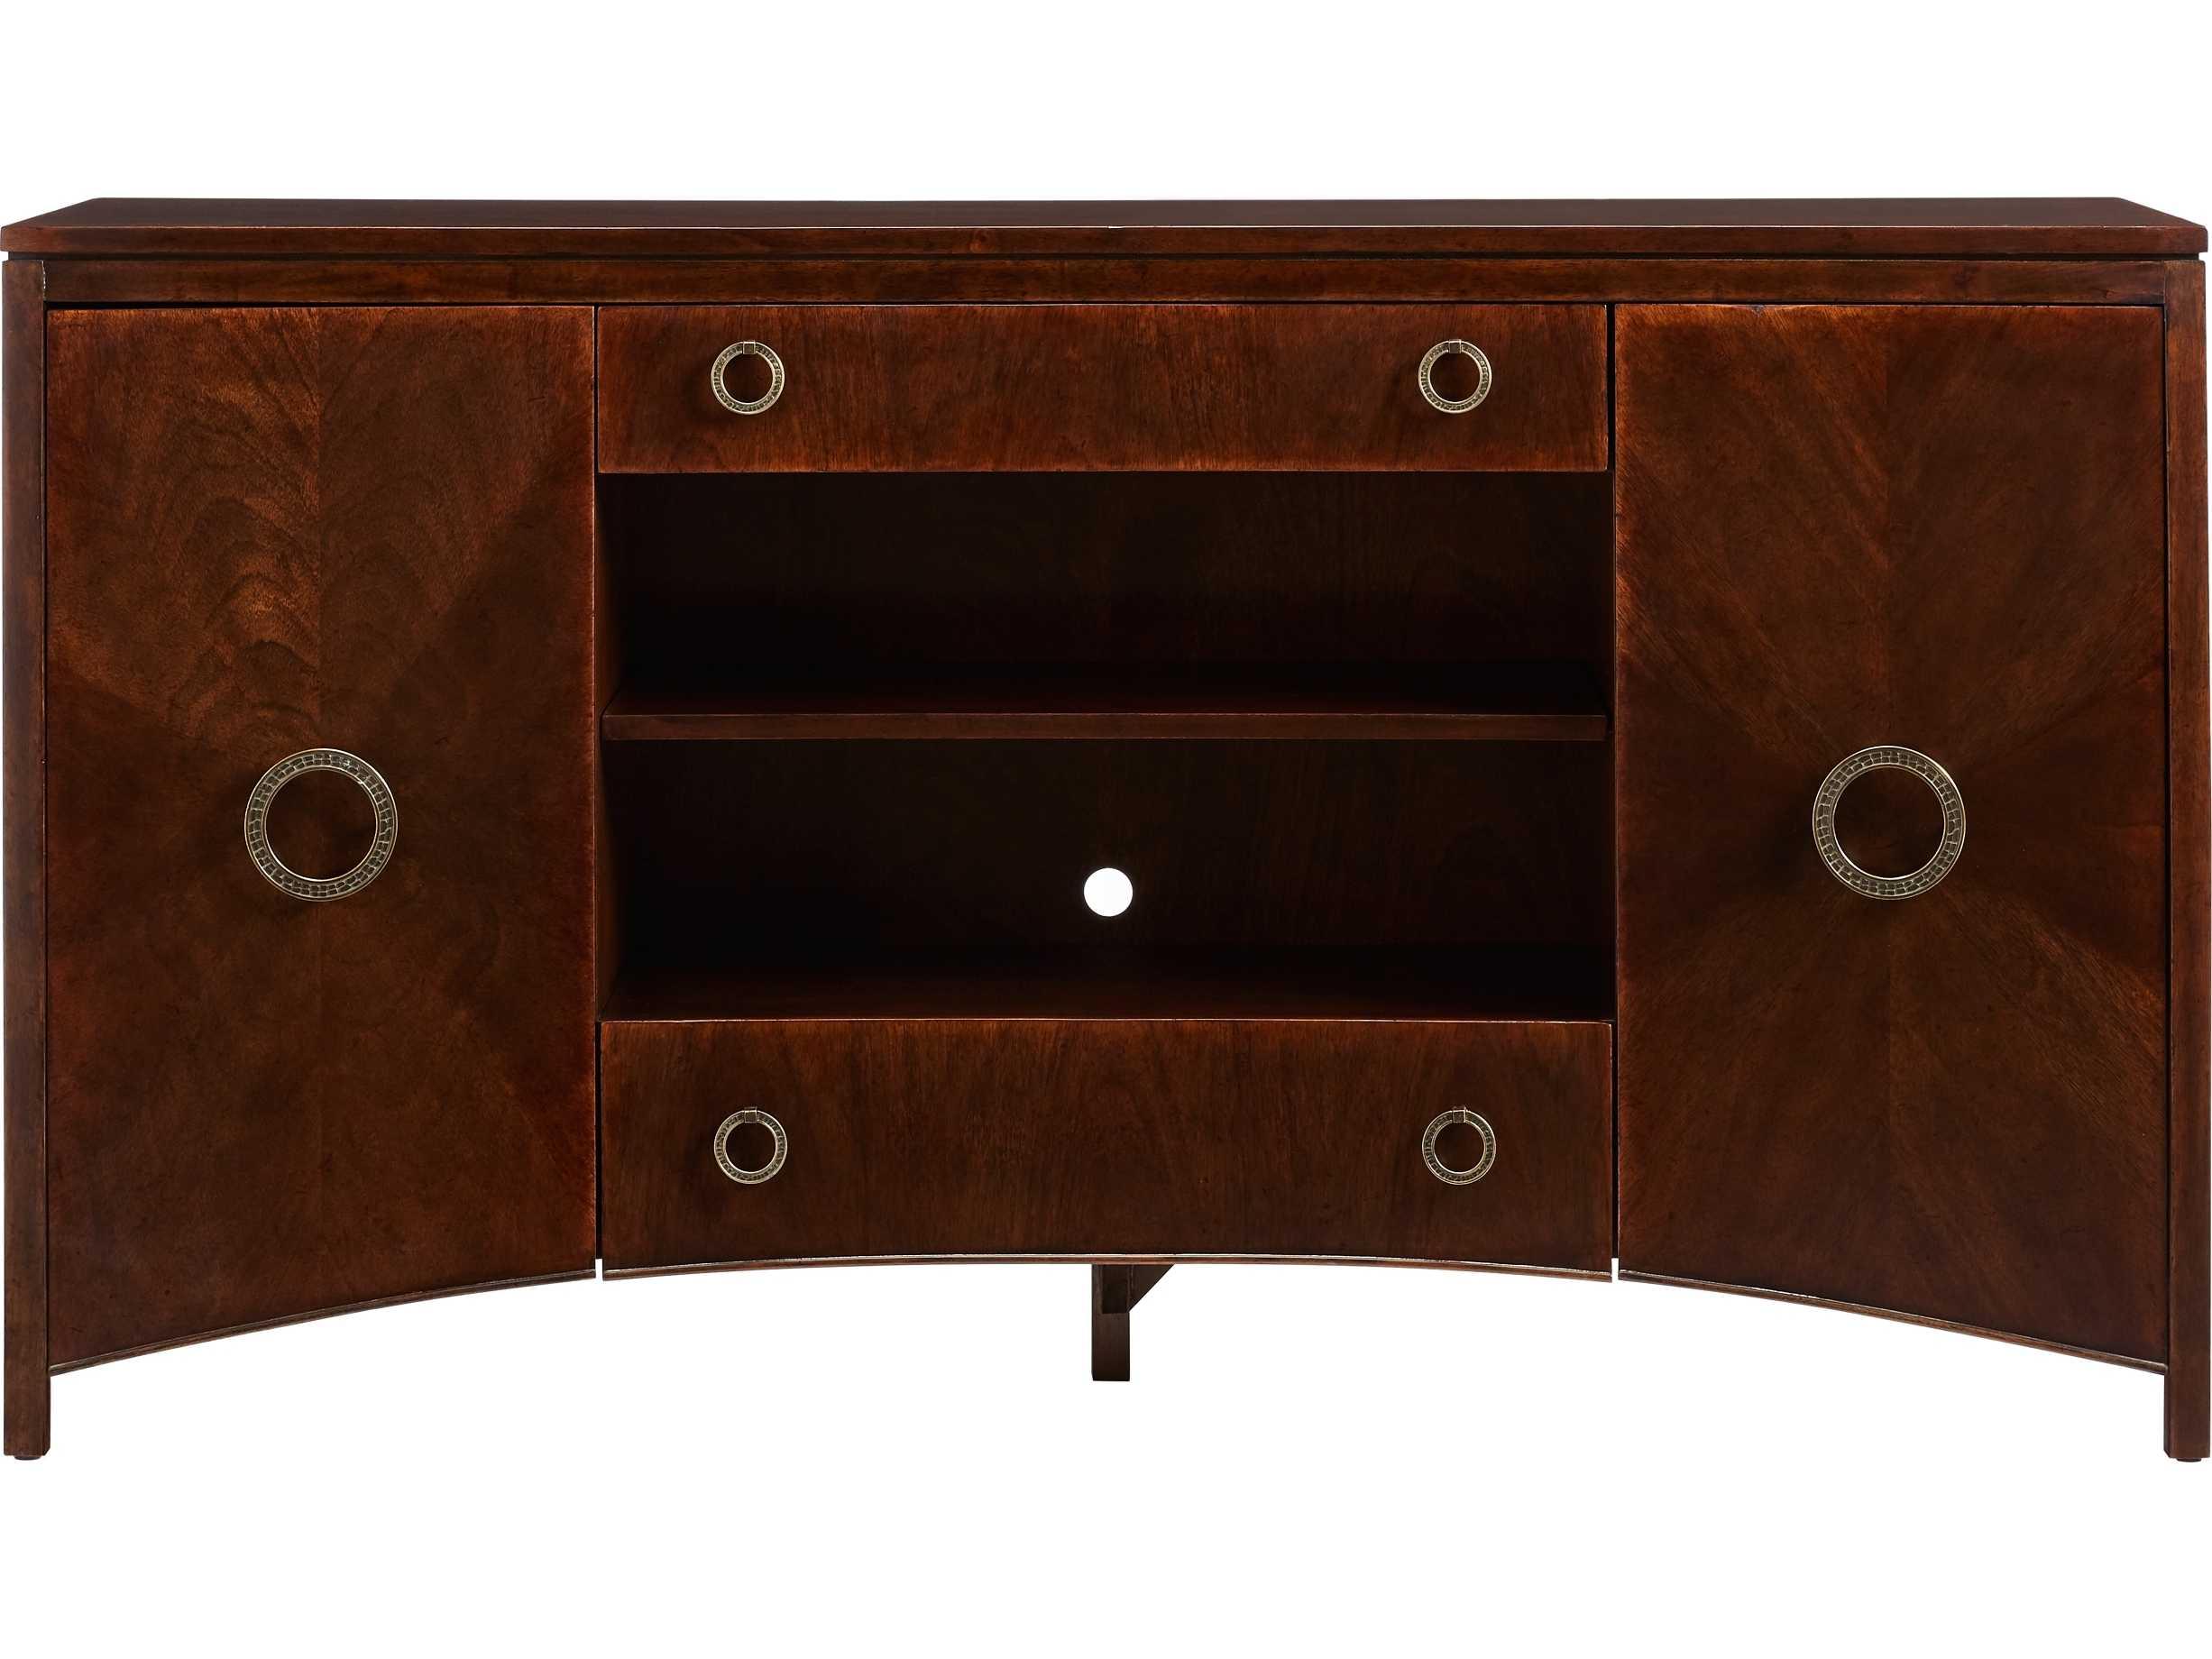 Stanley Furniture Havana Crossing Colonial Mahogany 65 L